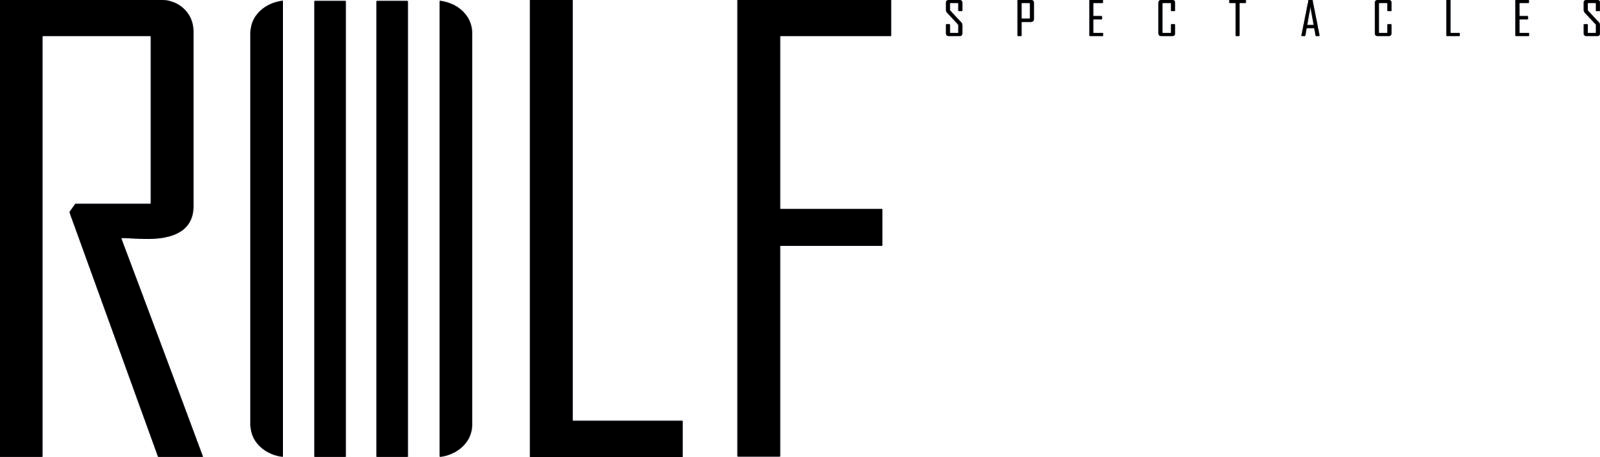 ROLF-Spectacles-logo-black